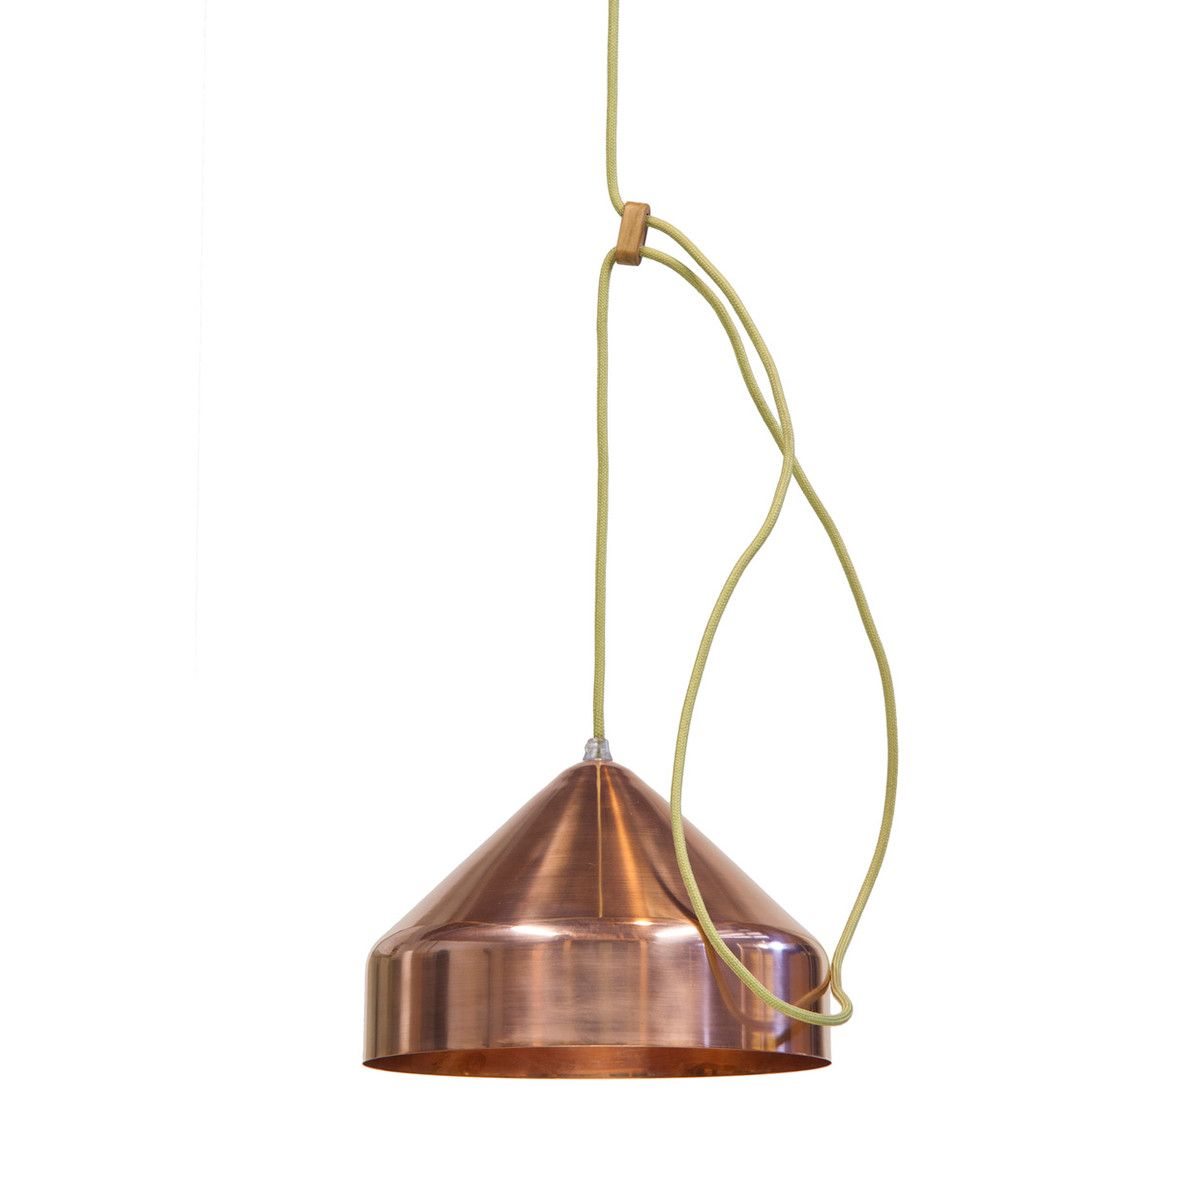 eu.Fab.com | Kupferlampe Lloop Kupfer | LIGHTING | Pinterest ...